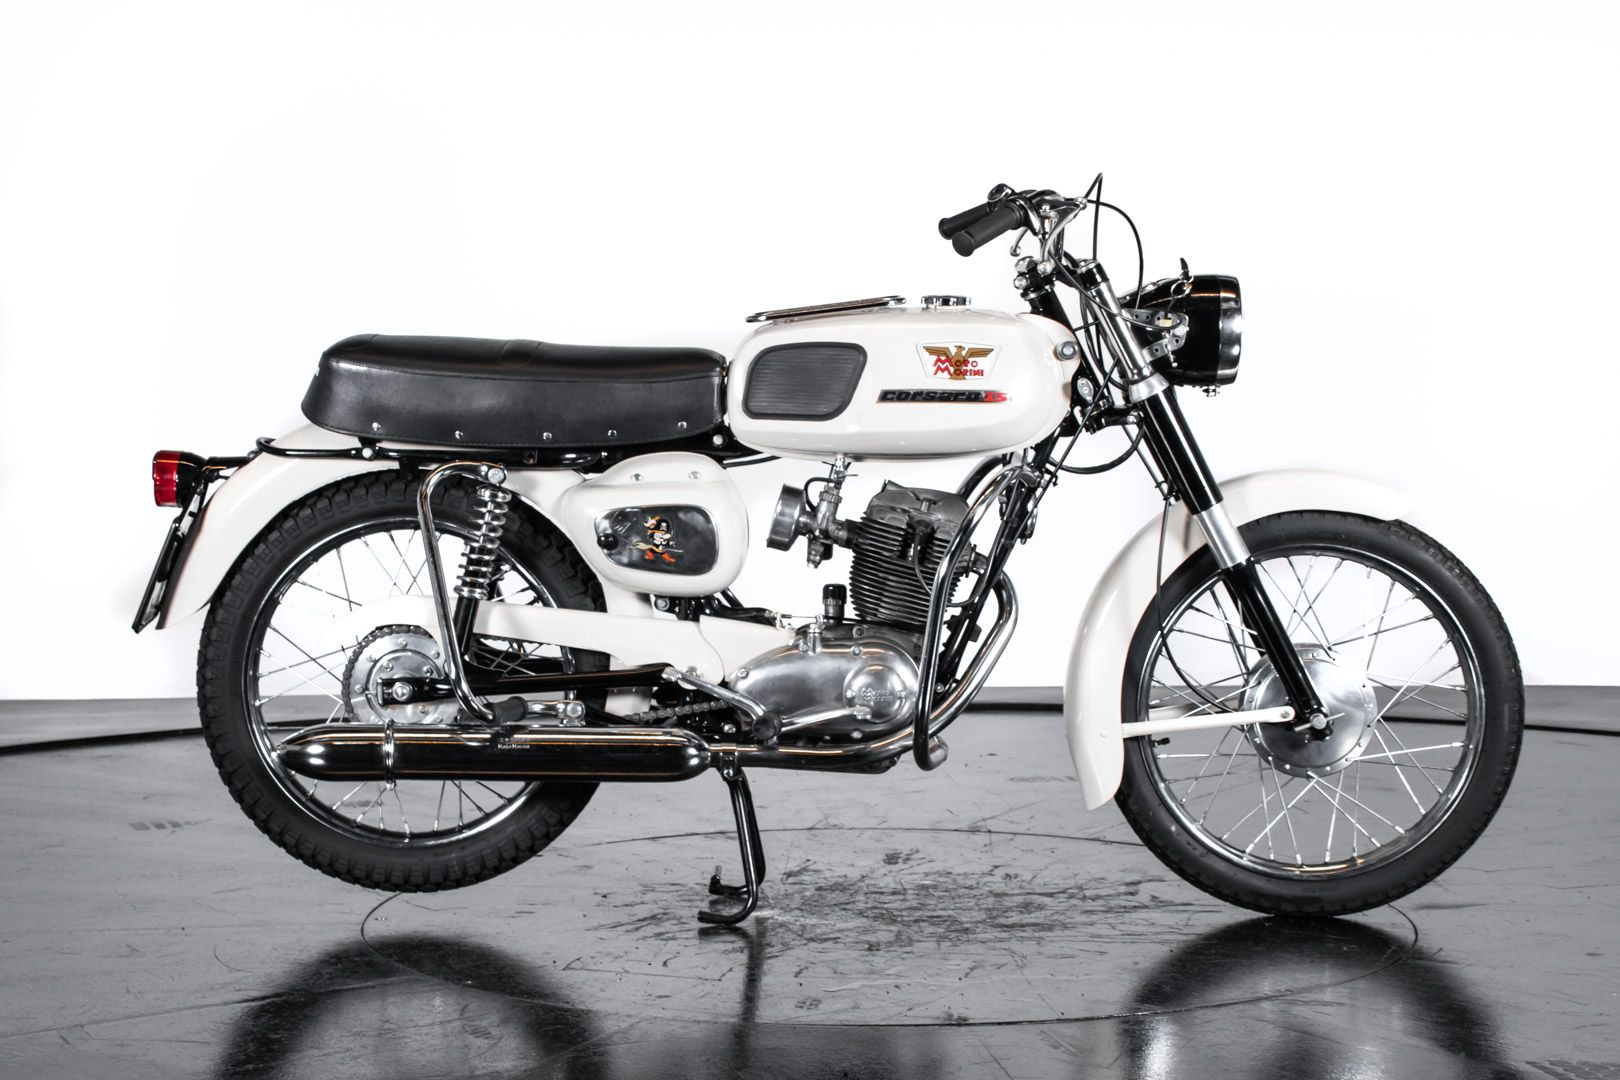 1971 Moto Morini Corsaro 150 82261